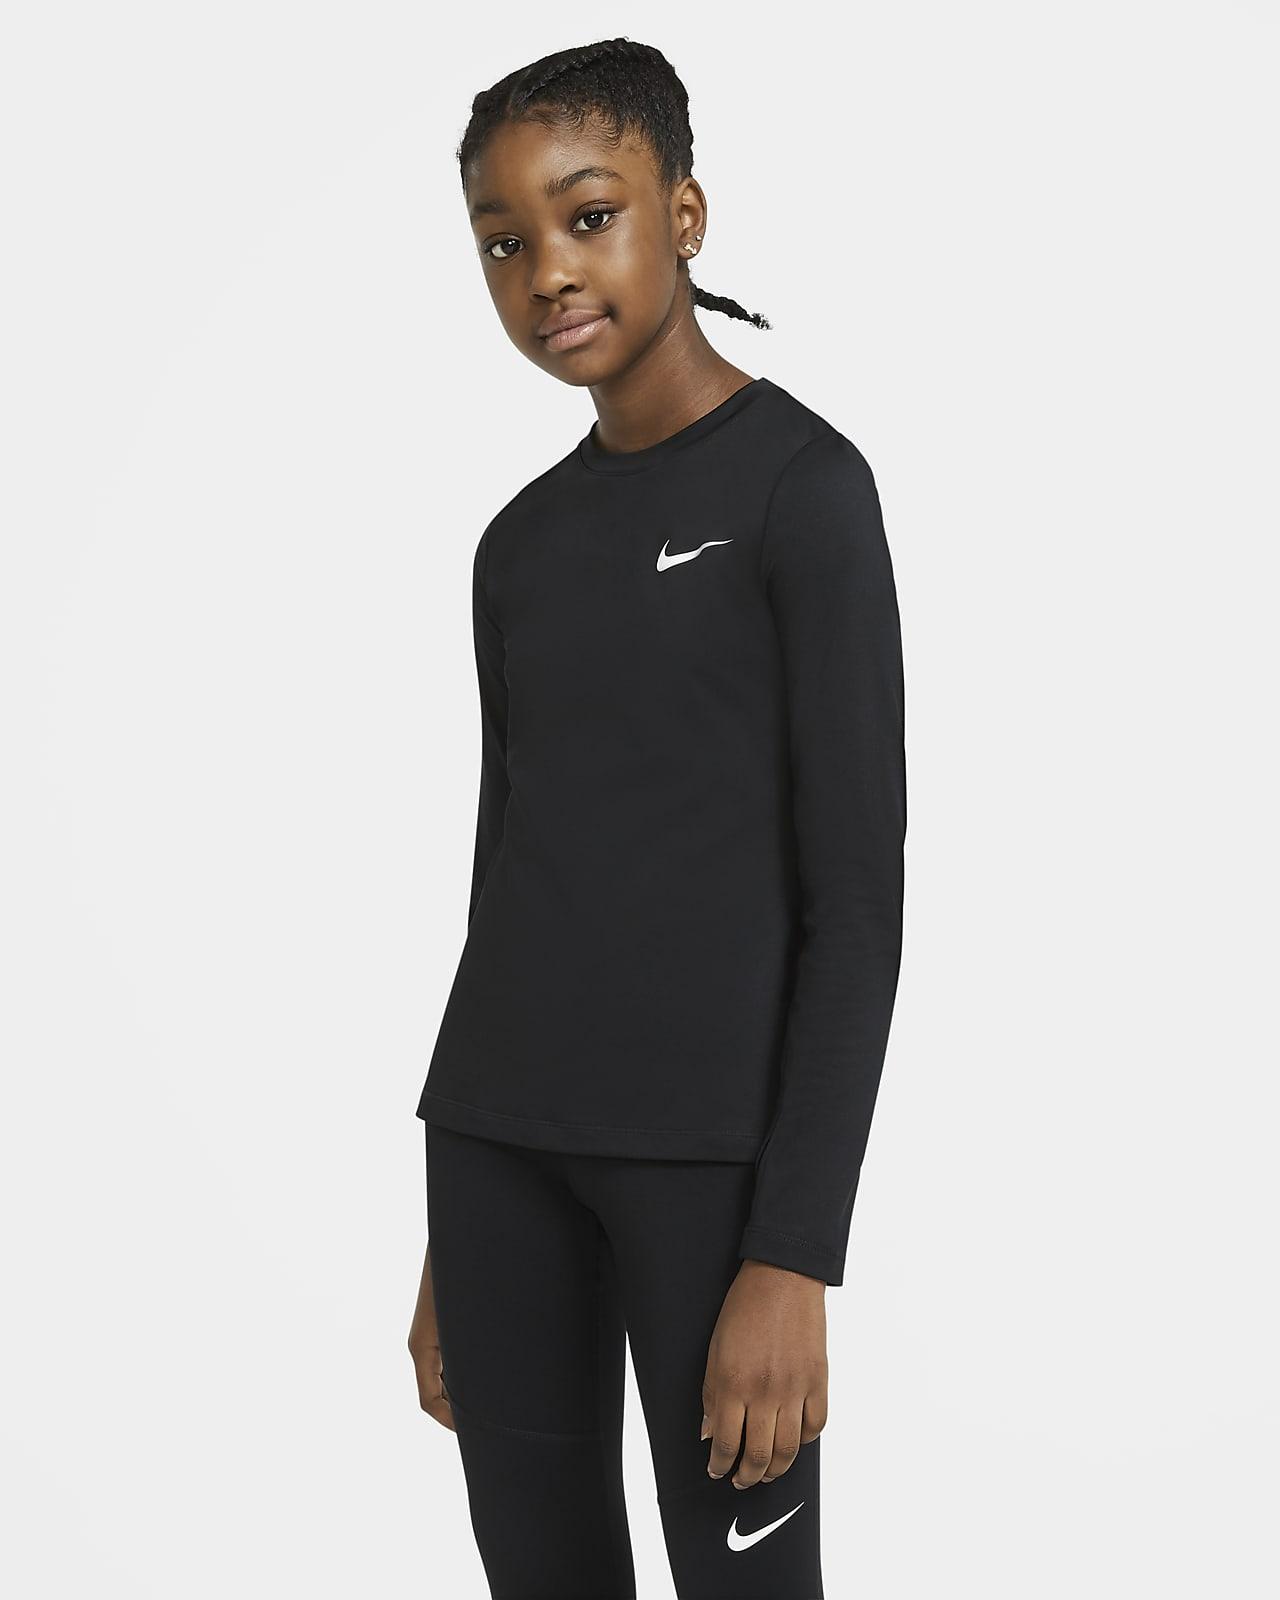 Prenda para la parte superior de manga larga para niñas talla grande Nike Pro Warm